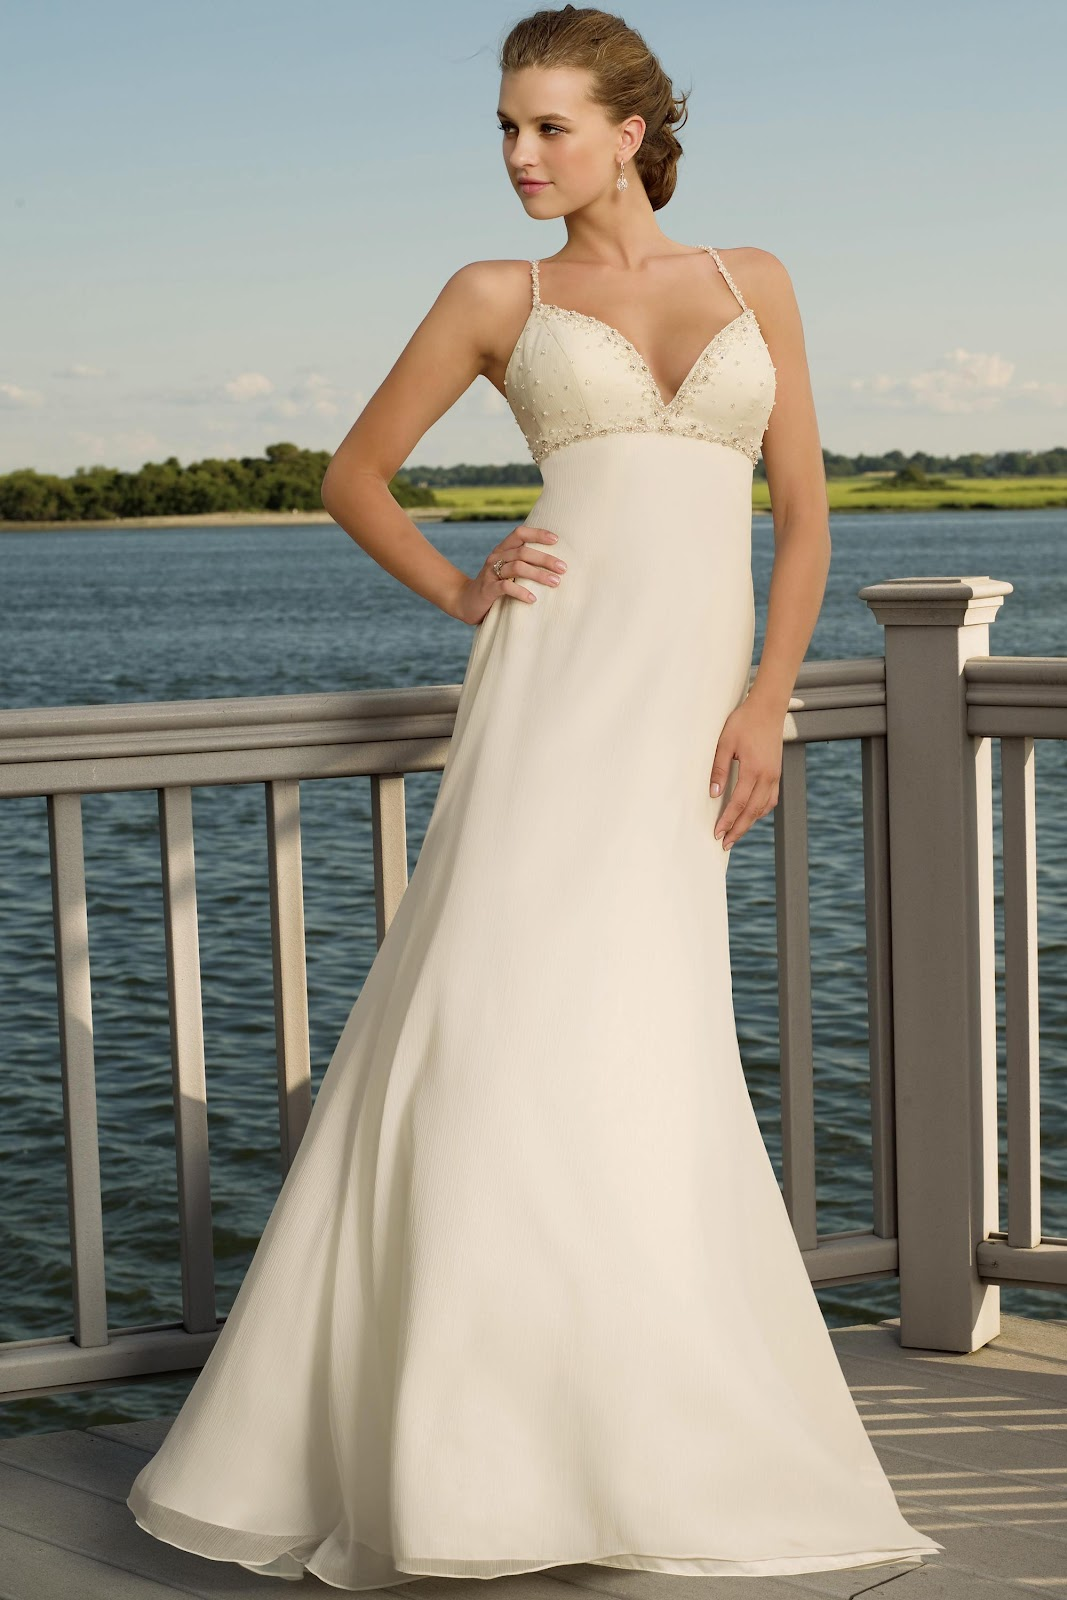 Strapless Simple Beach Wedding Dresses